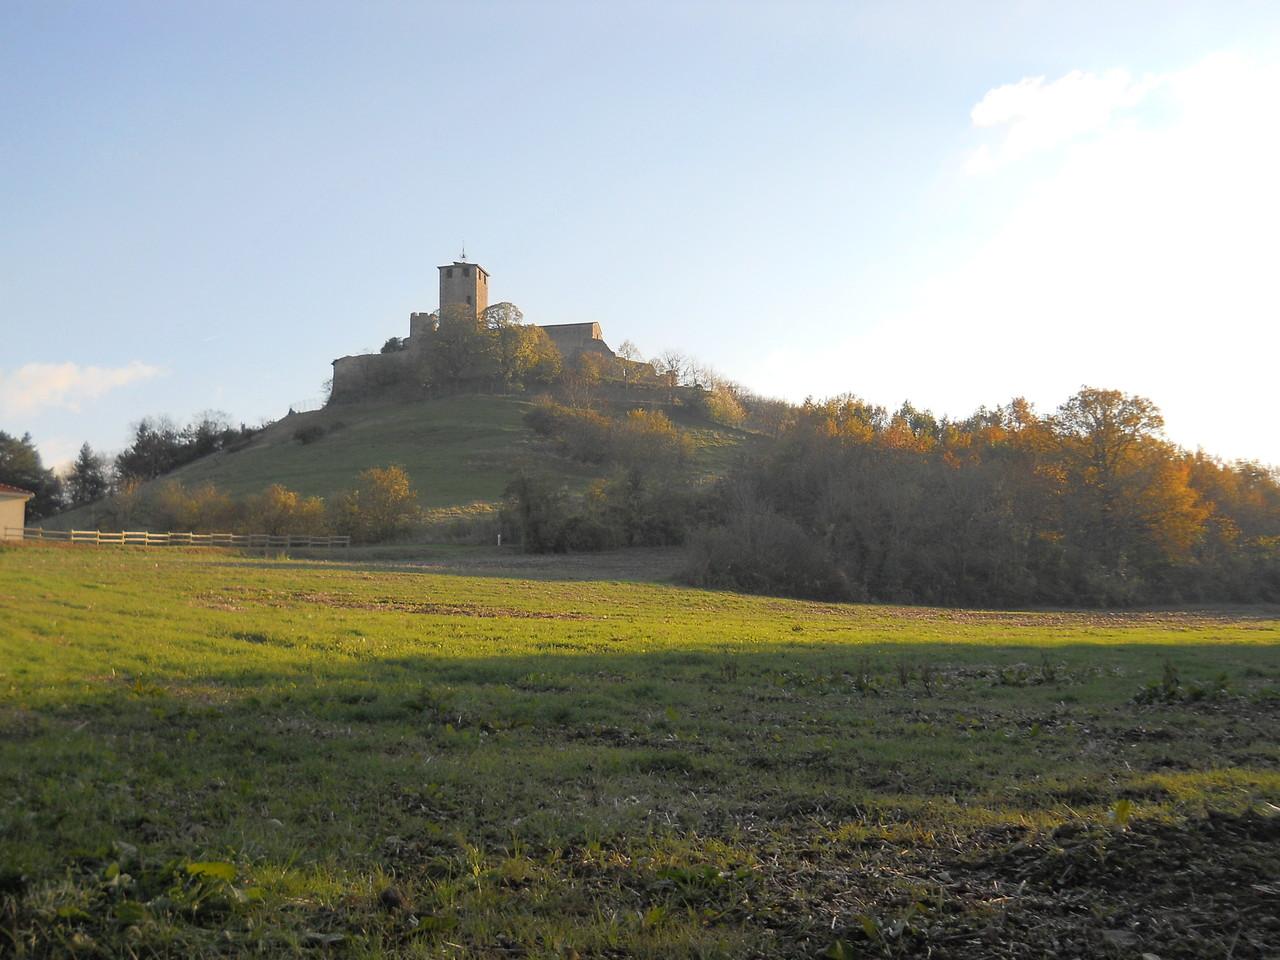 Pic de Montverdun